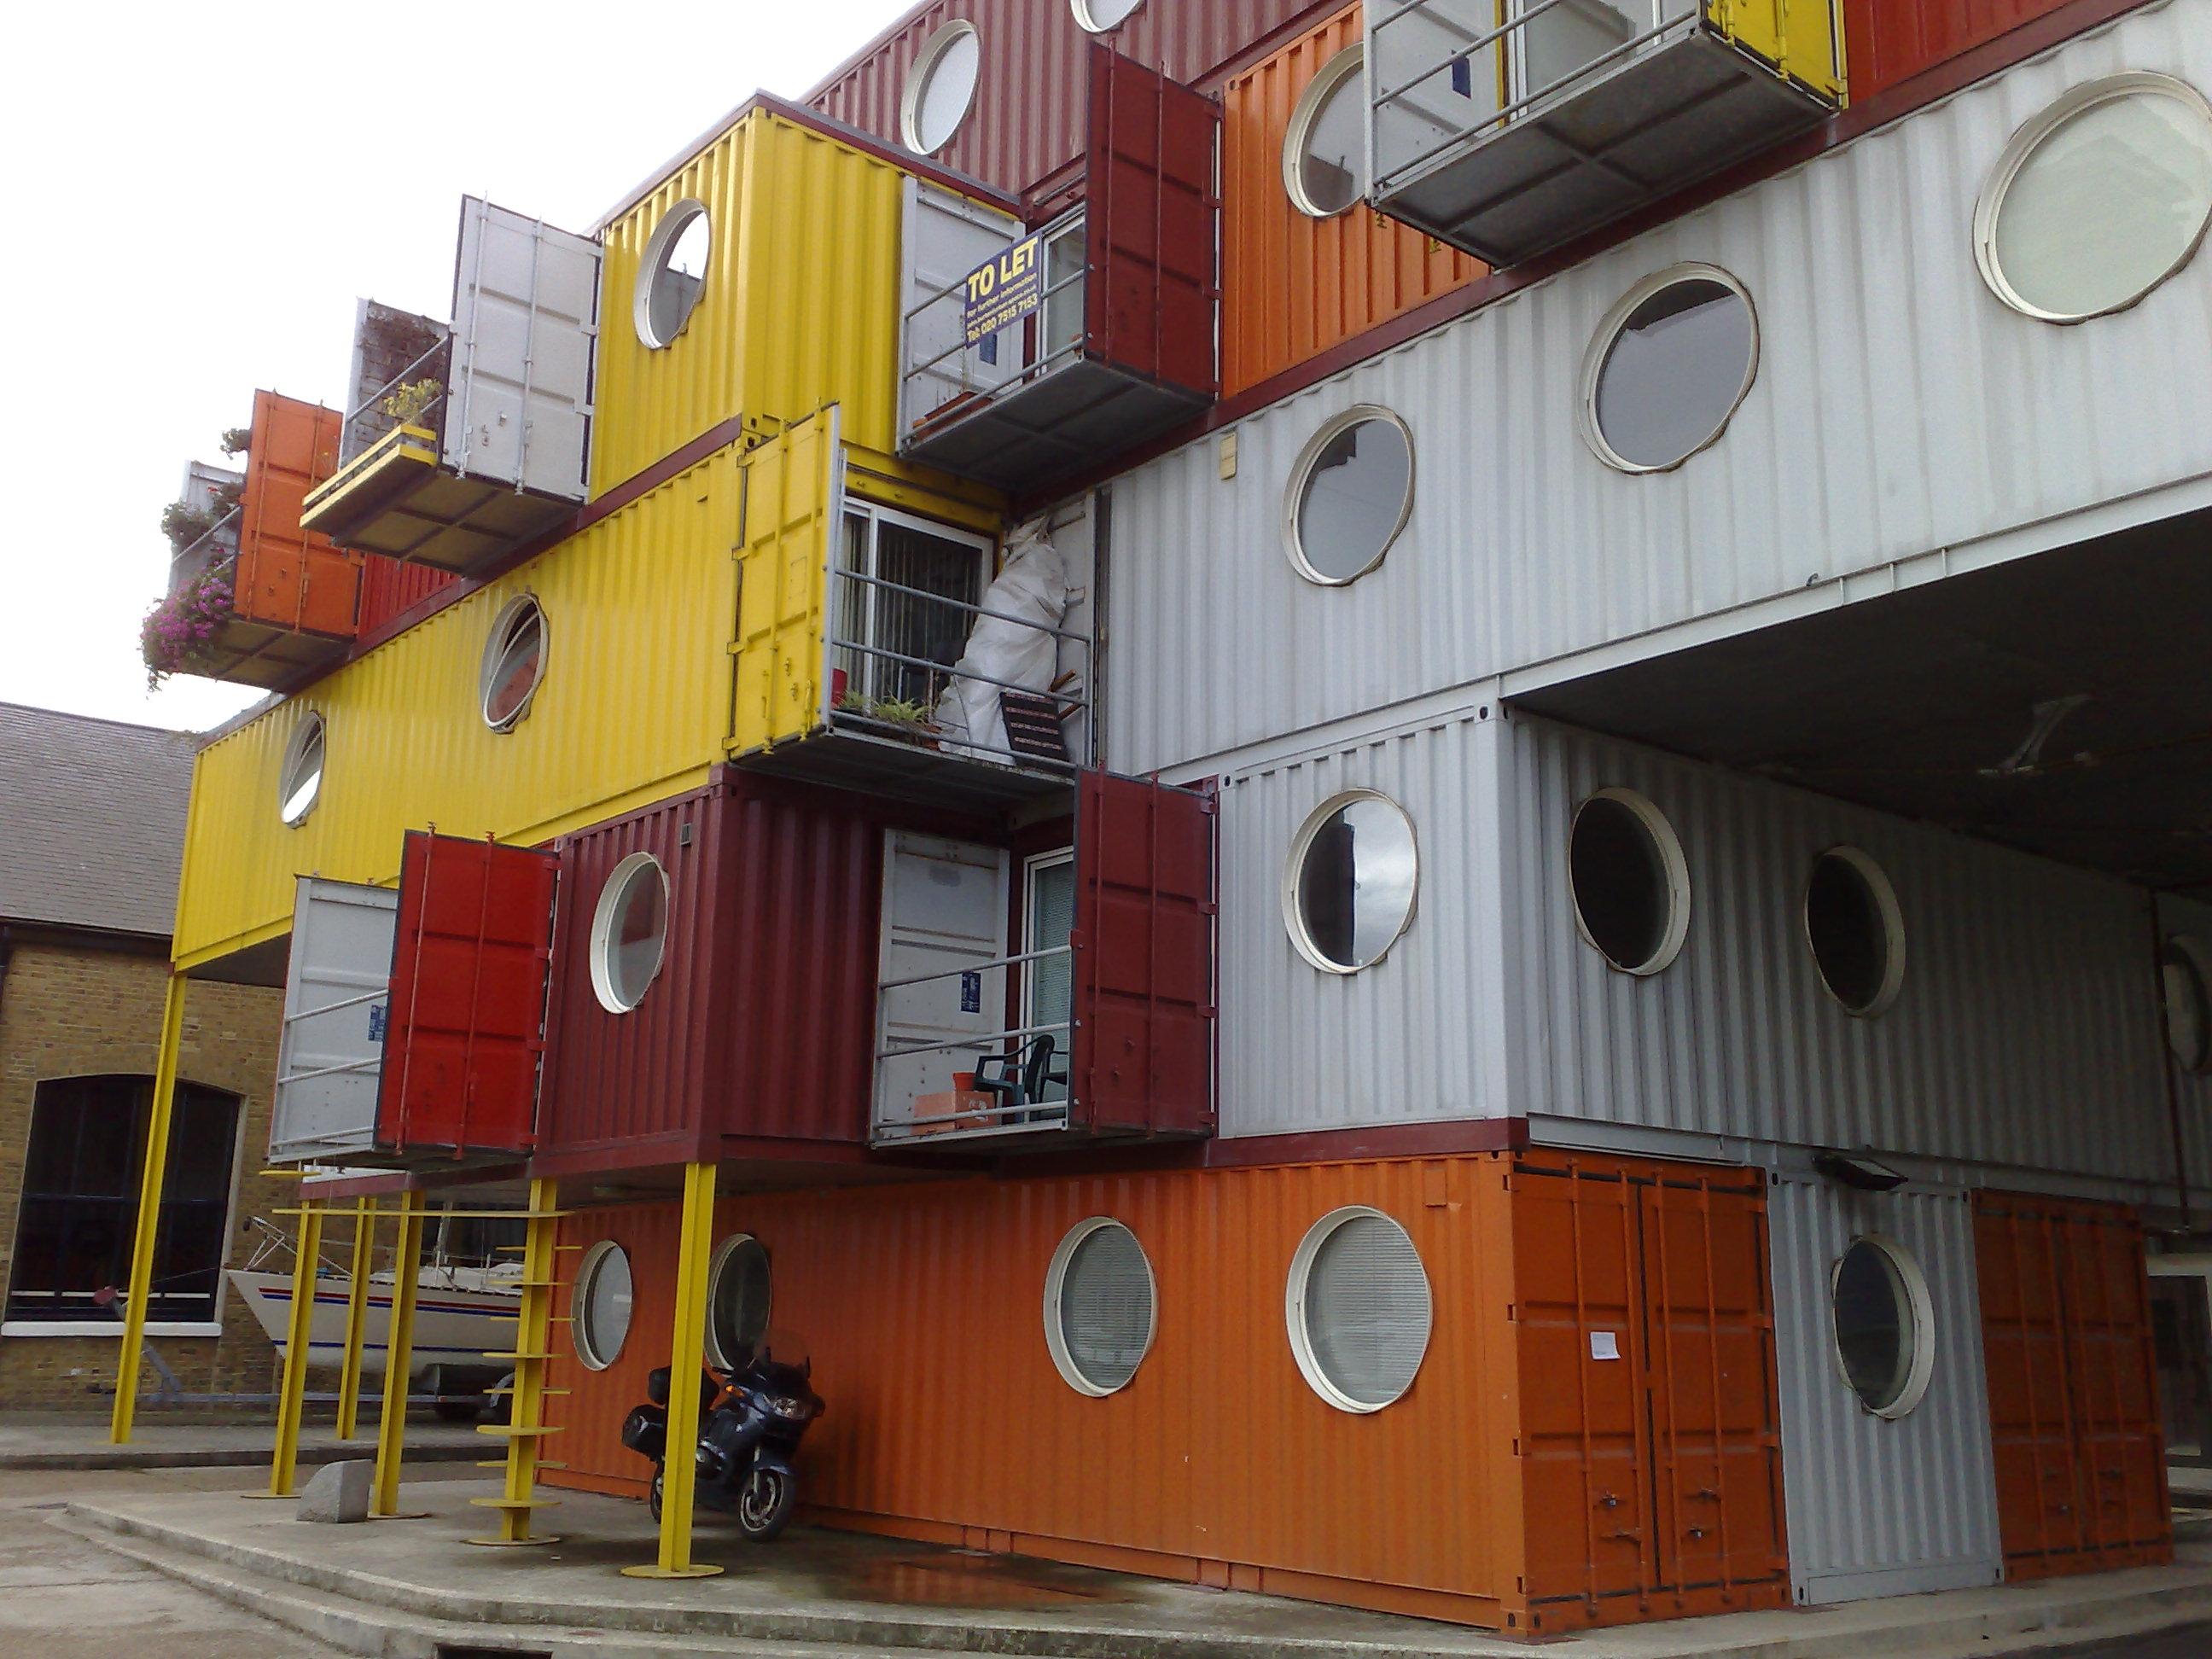 Habitat modulable alternatif et conomique for Container habitation modulaire